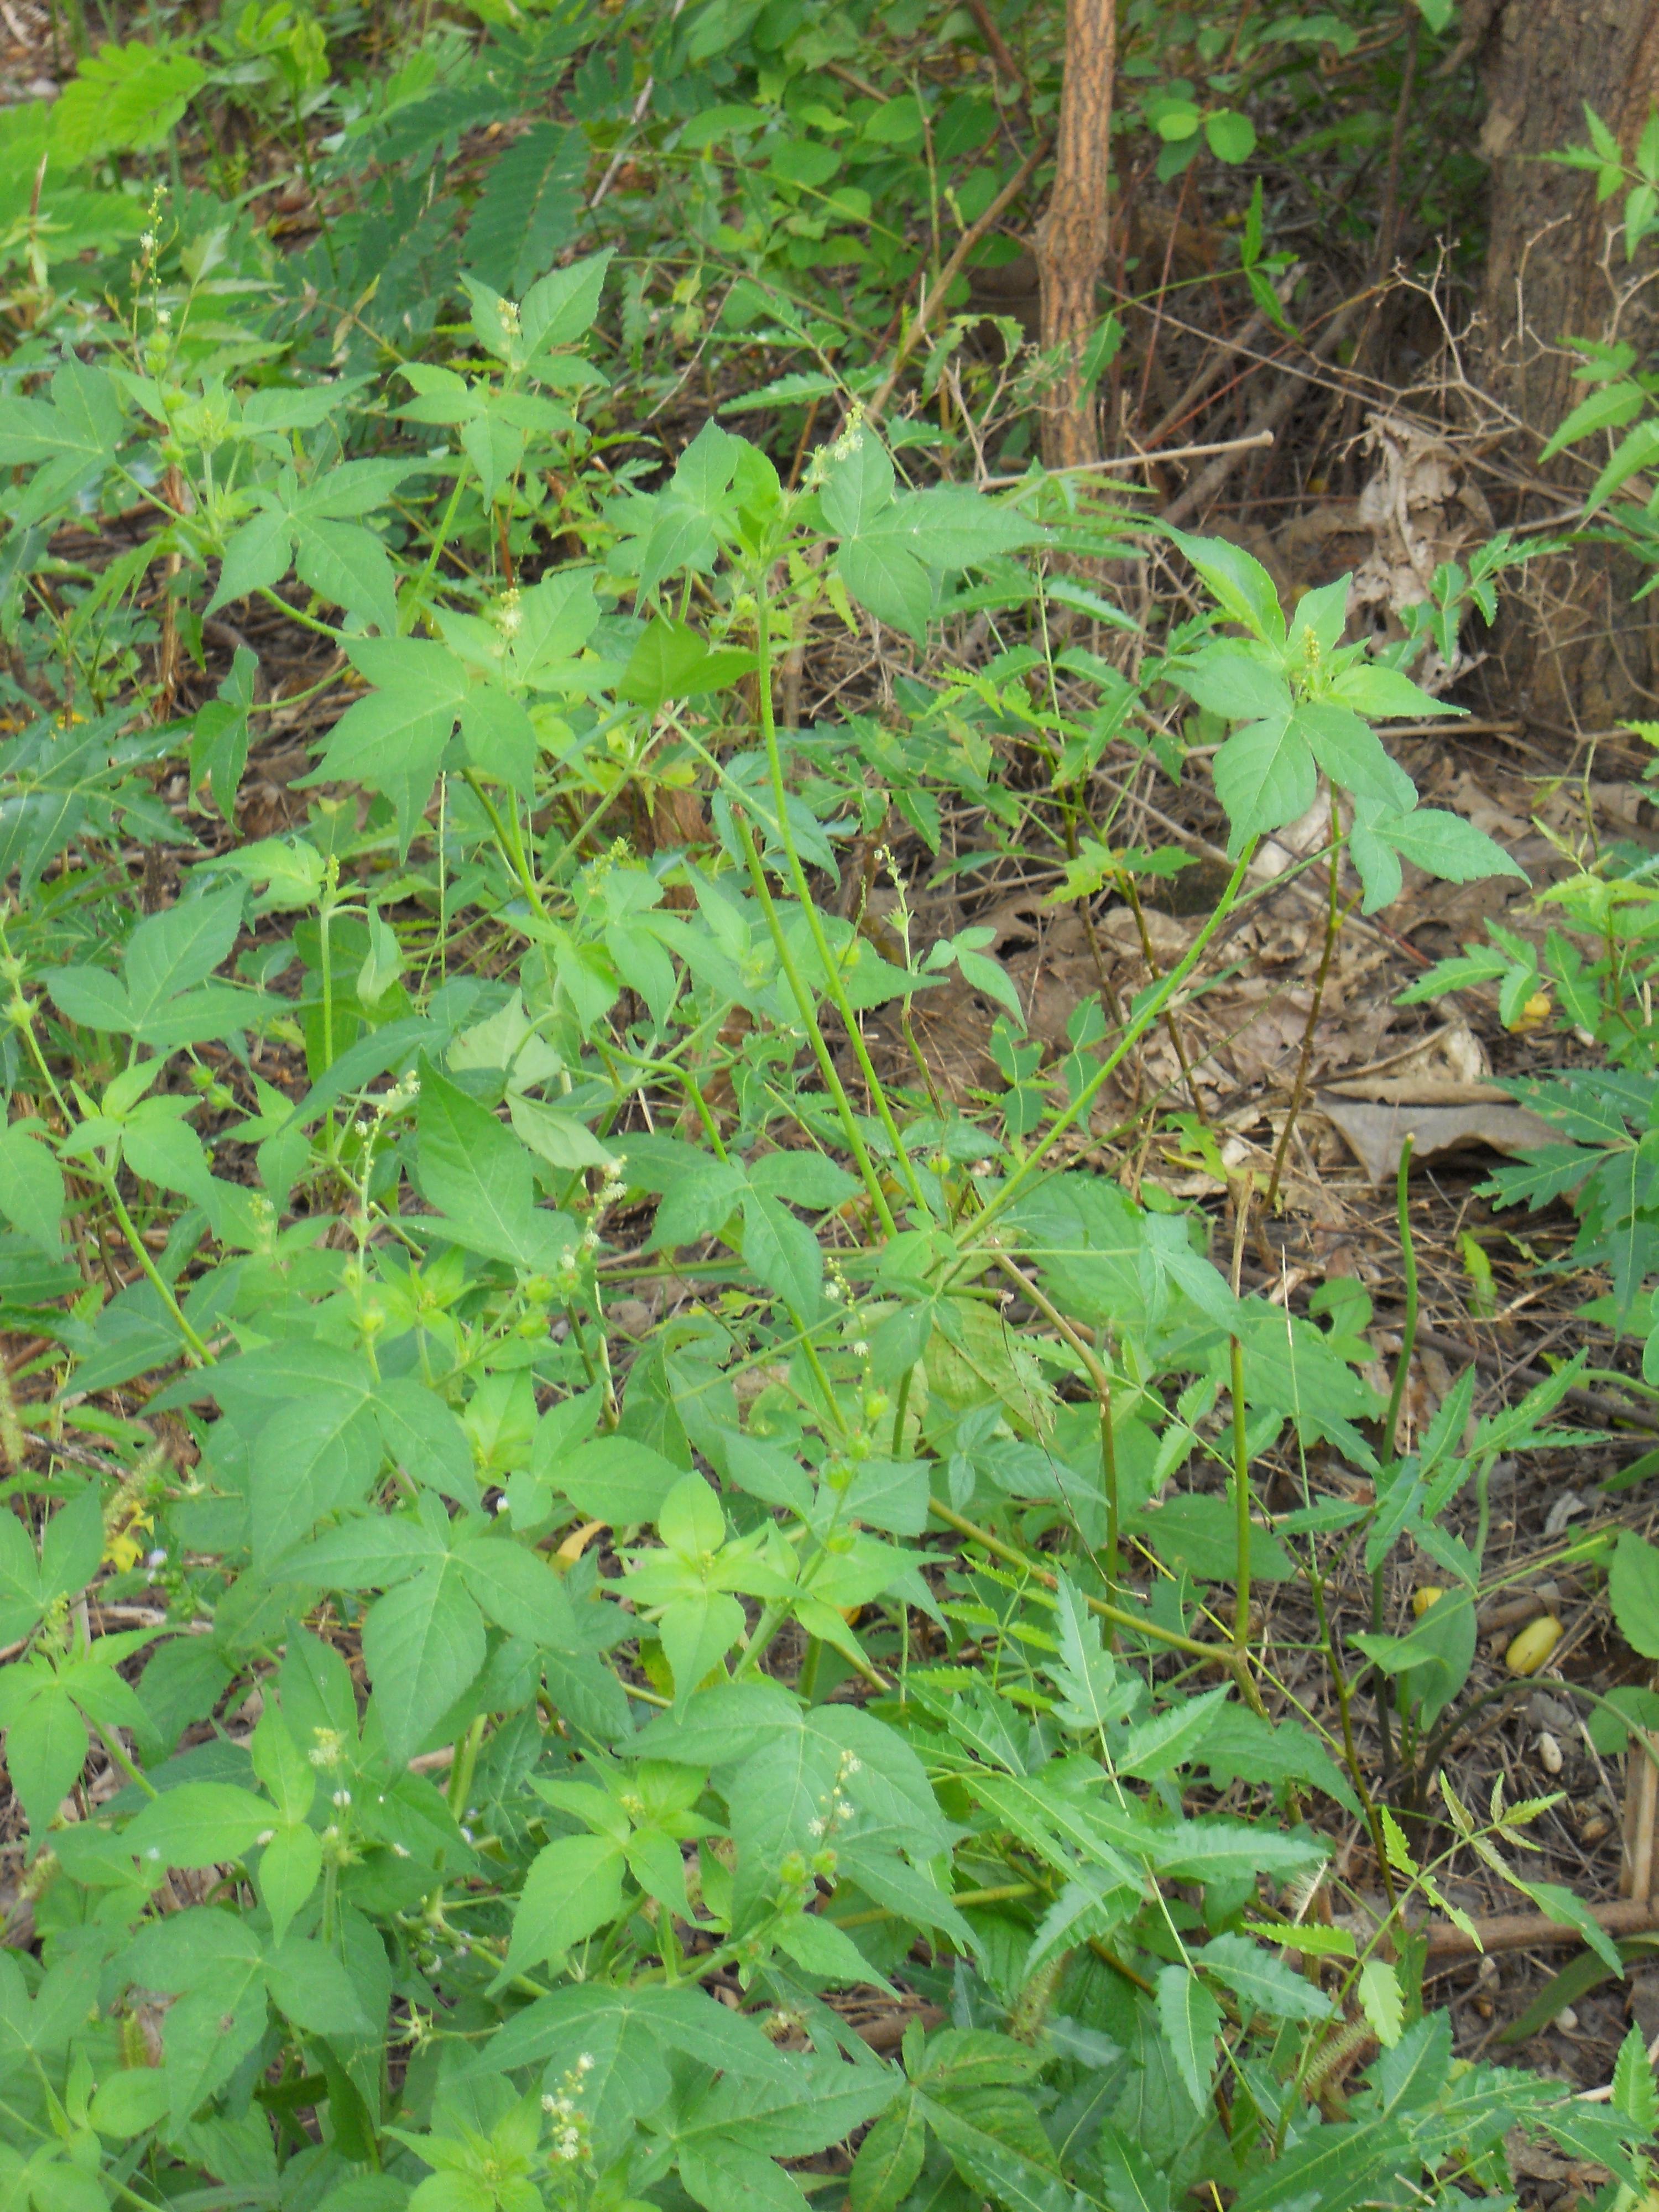 plants growing in upland field